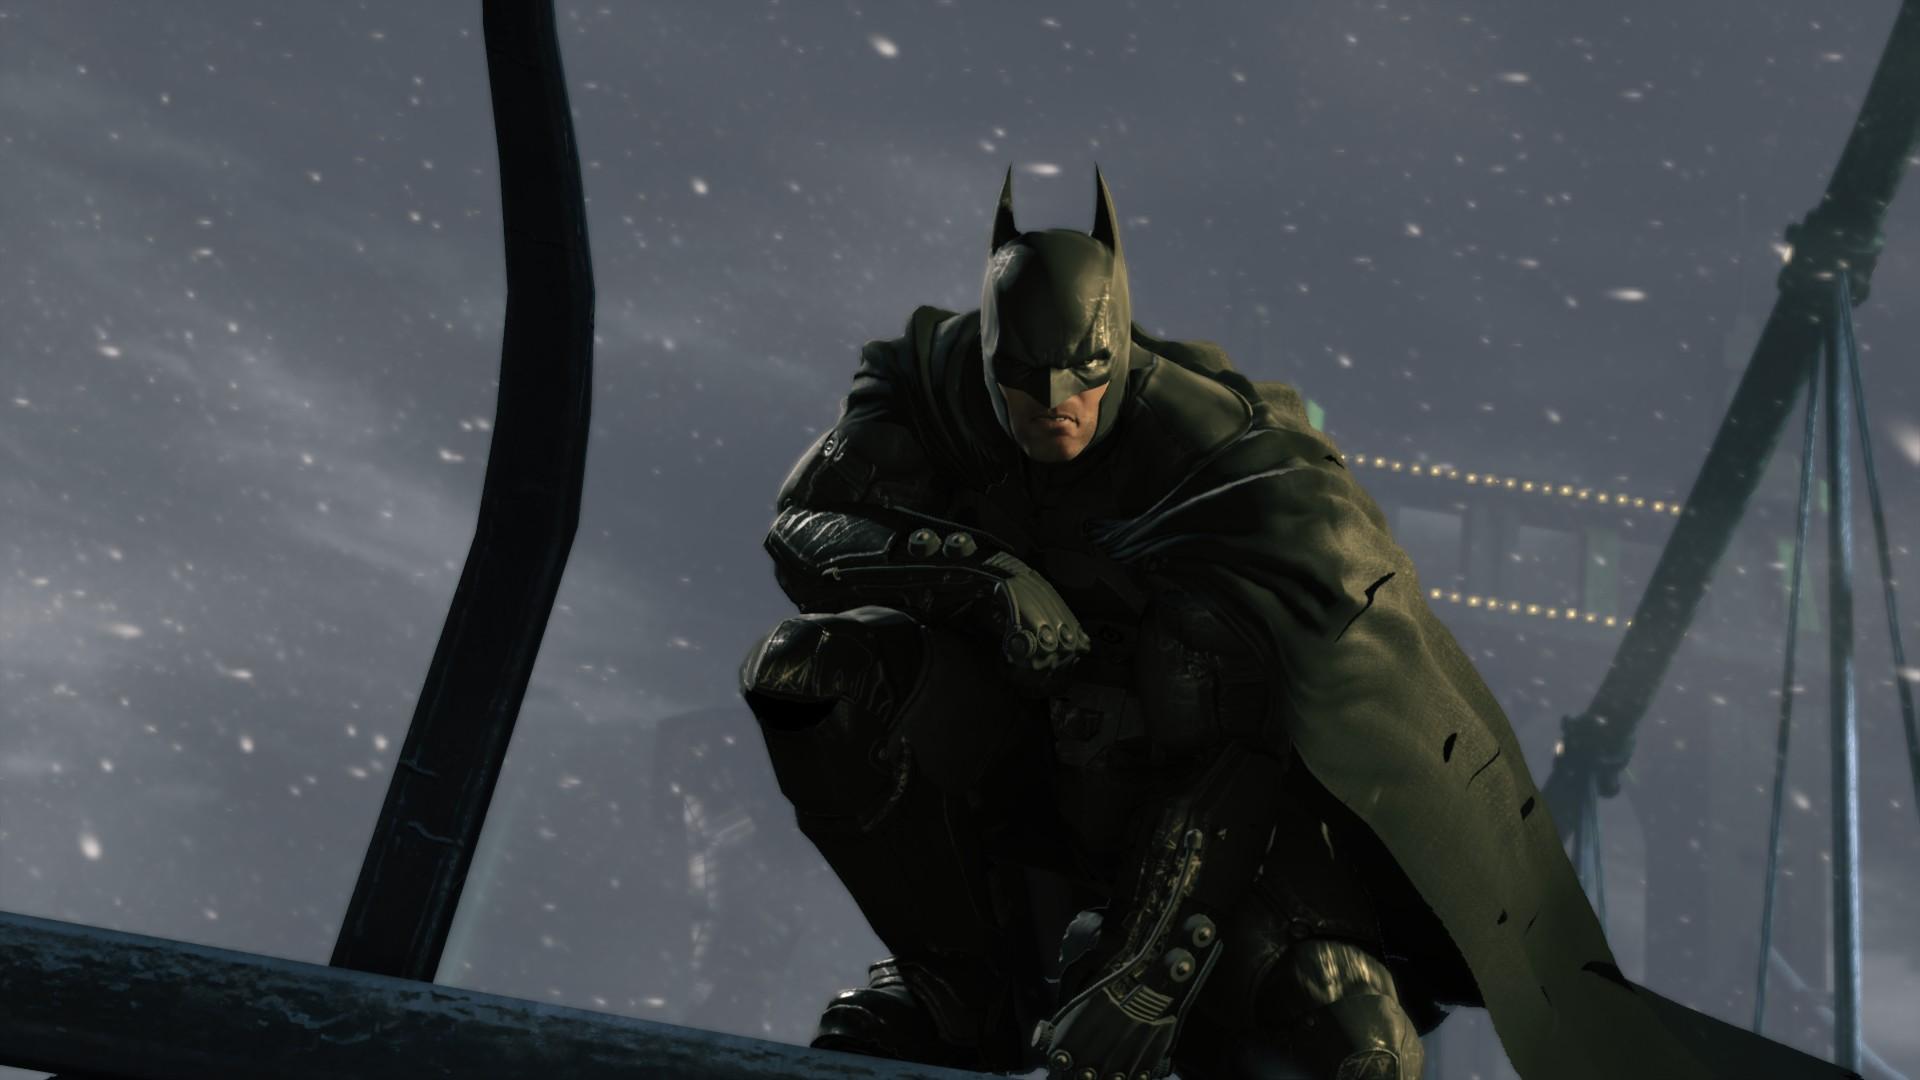 batman arkham origins - HD1024×1024